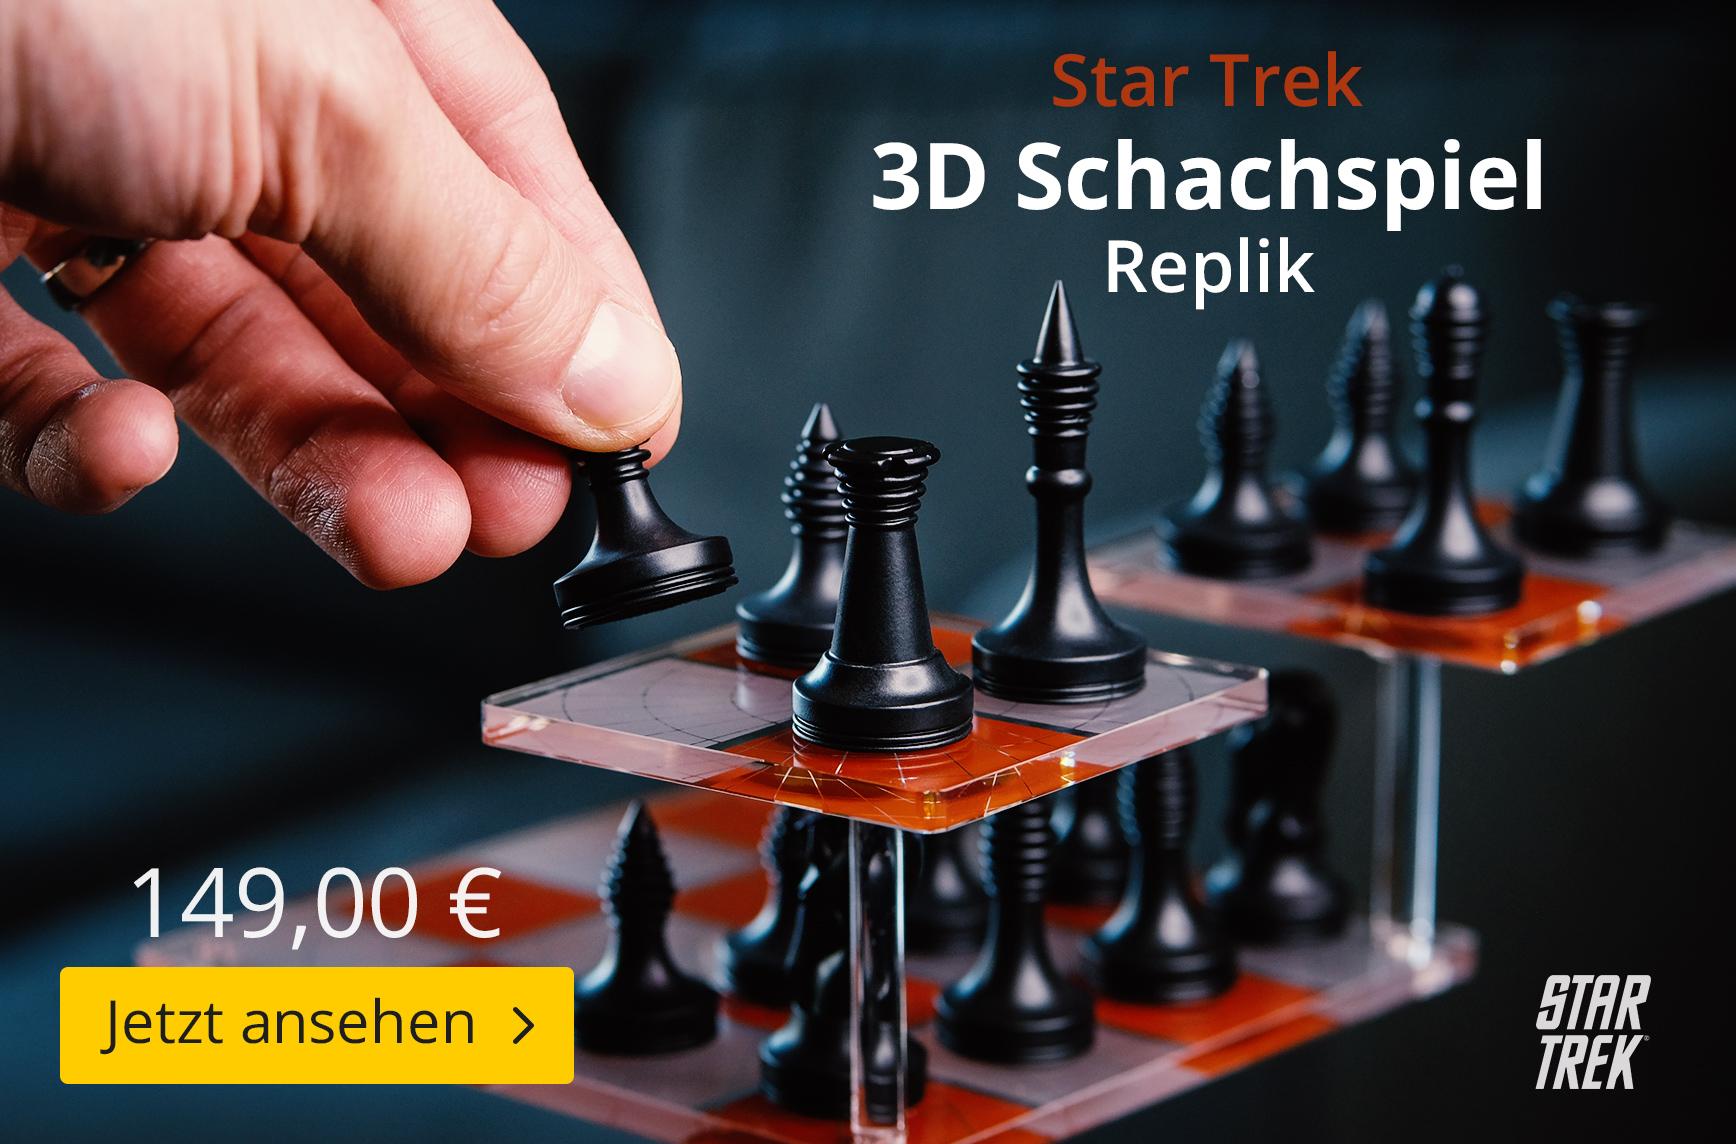 Star Trek - 3D Schachspiel Replik - 149 EUR